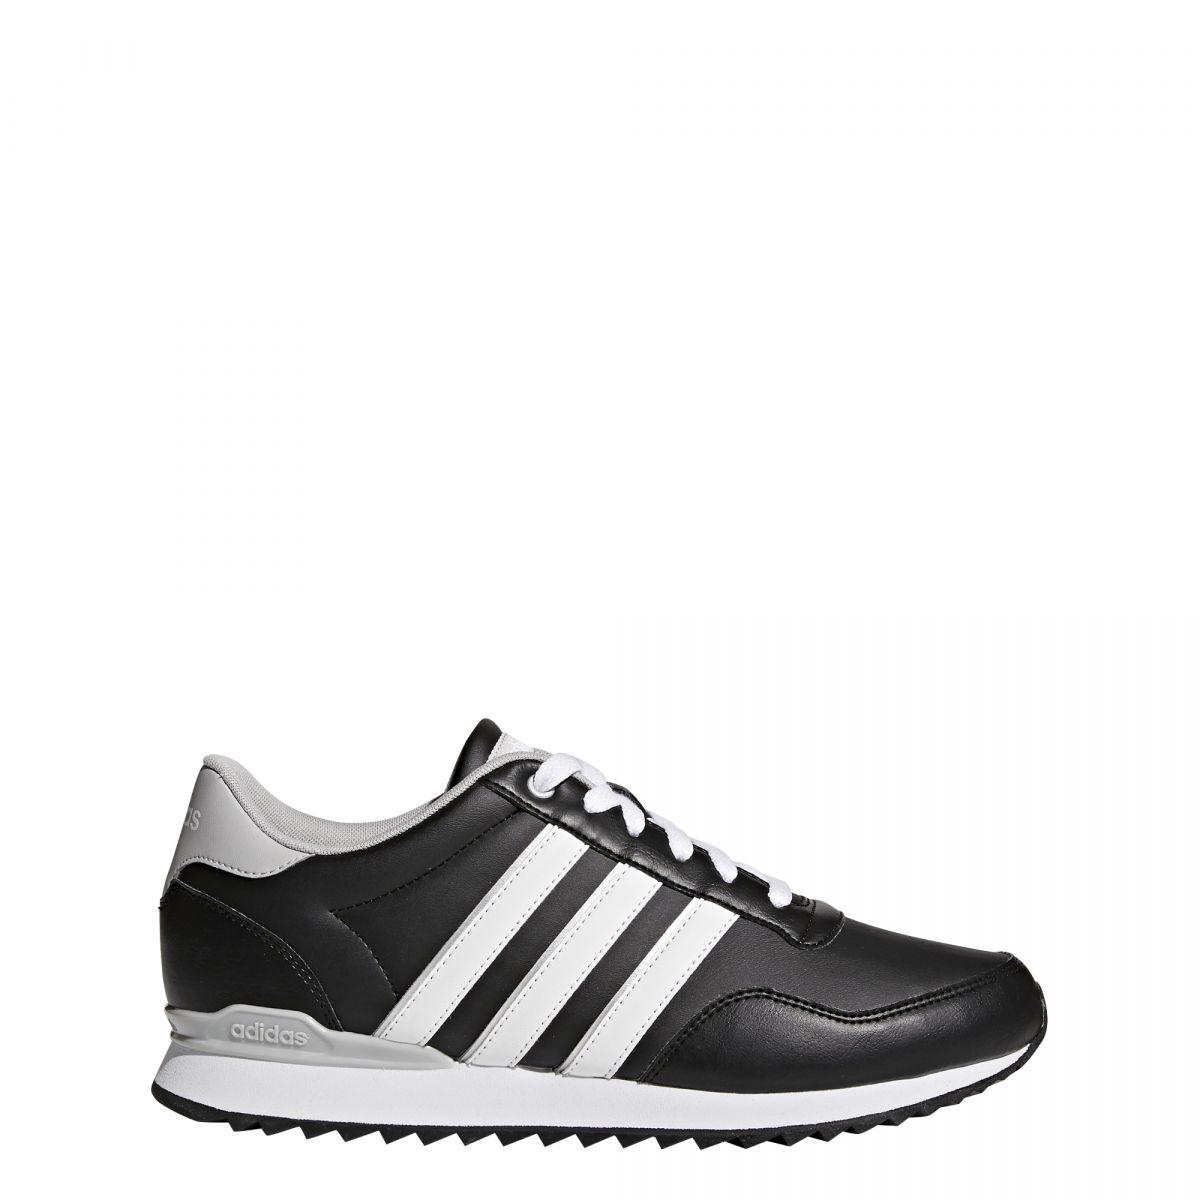 4fa6f5c8 Buty męskie Adidas Jogger Cl BB9682 r. 42 2/3 - 7302557731 ...